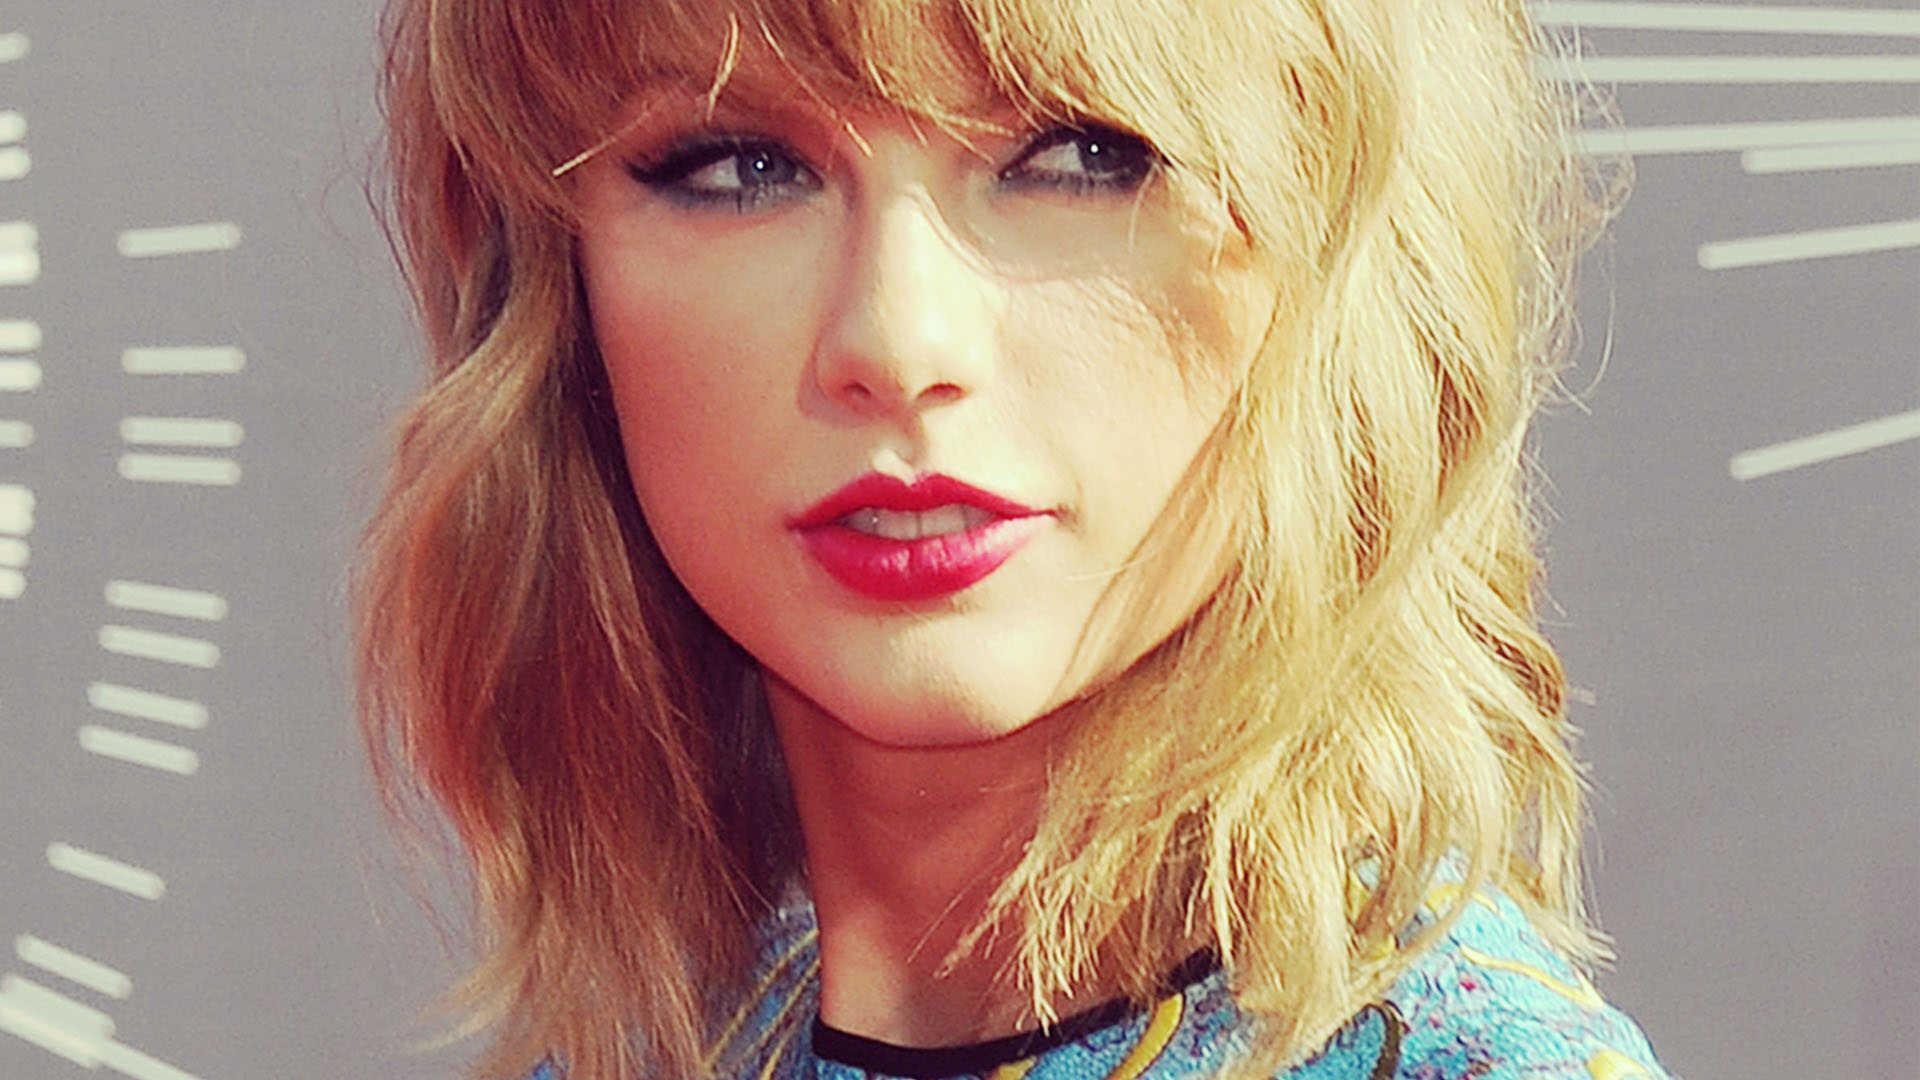 Taylor Swift HD 2017 Wallpapers 1920x1080